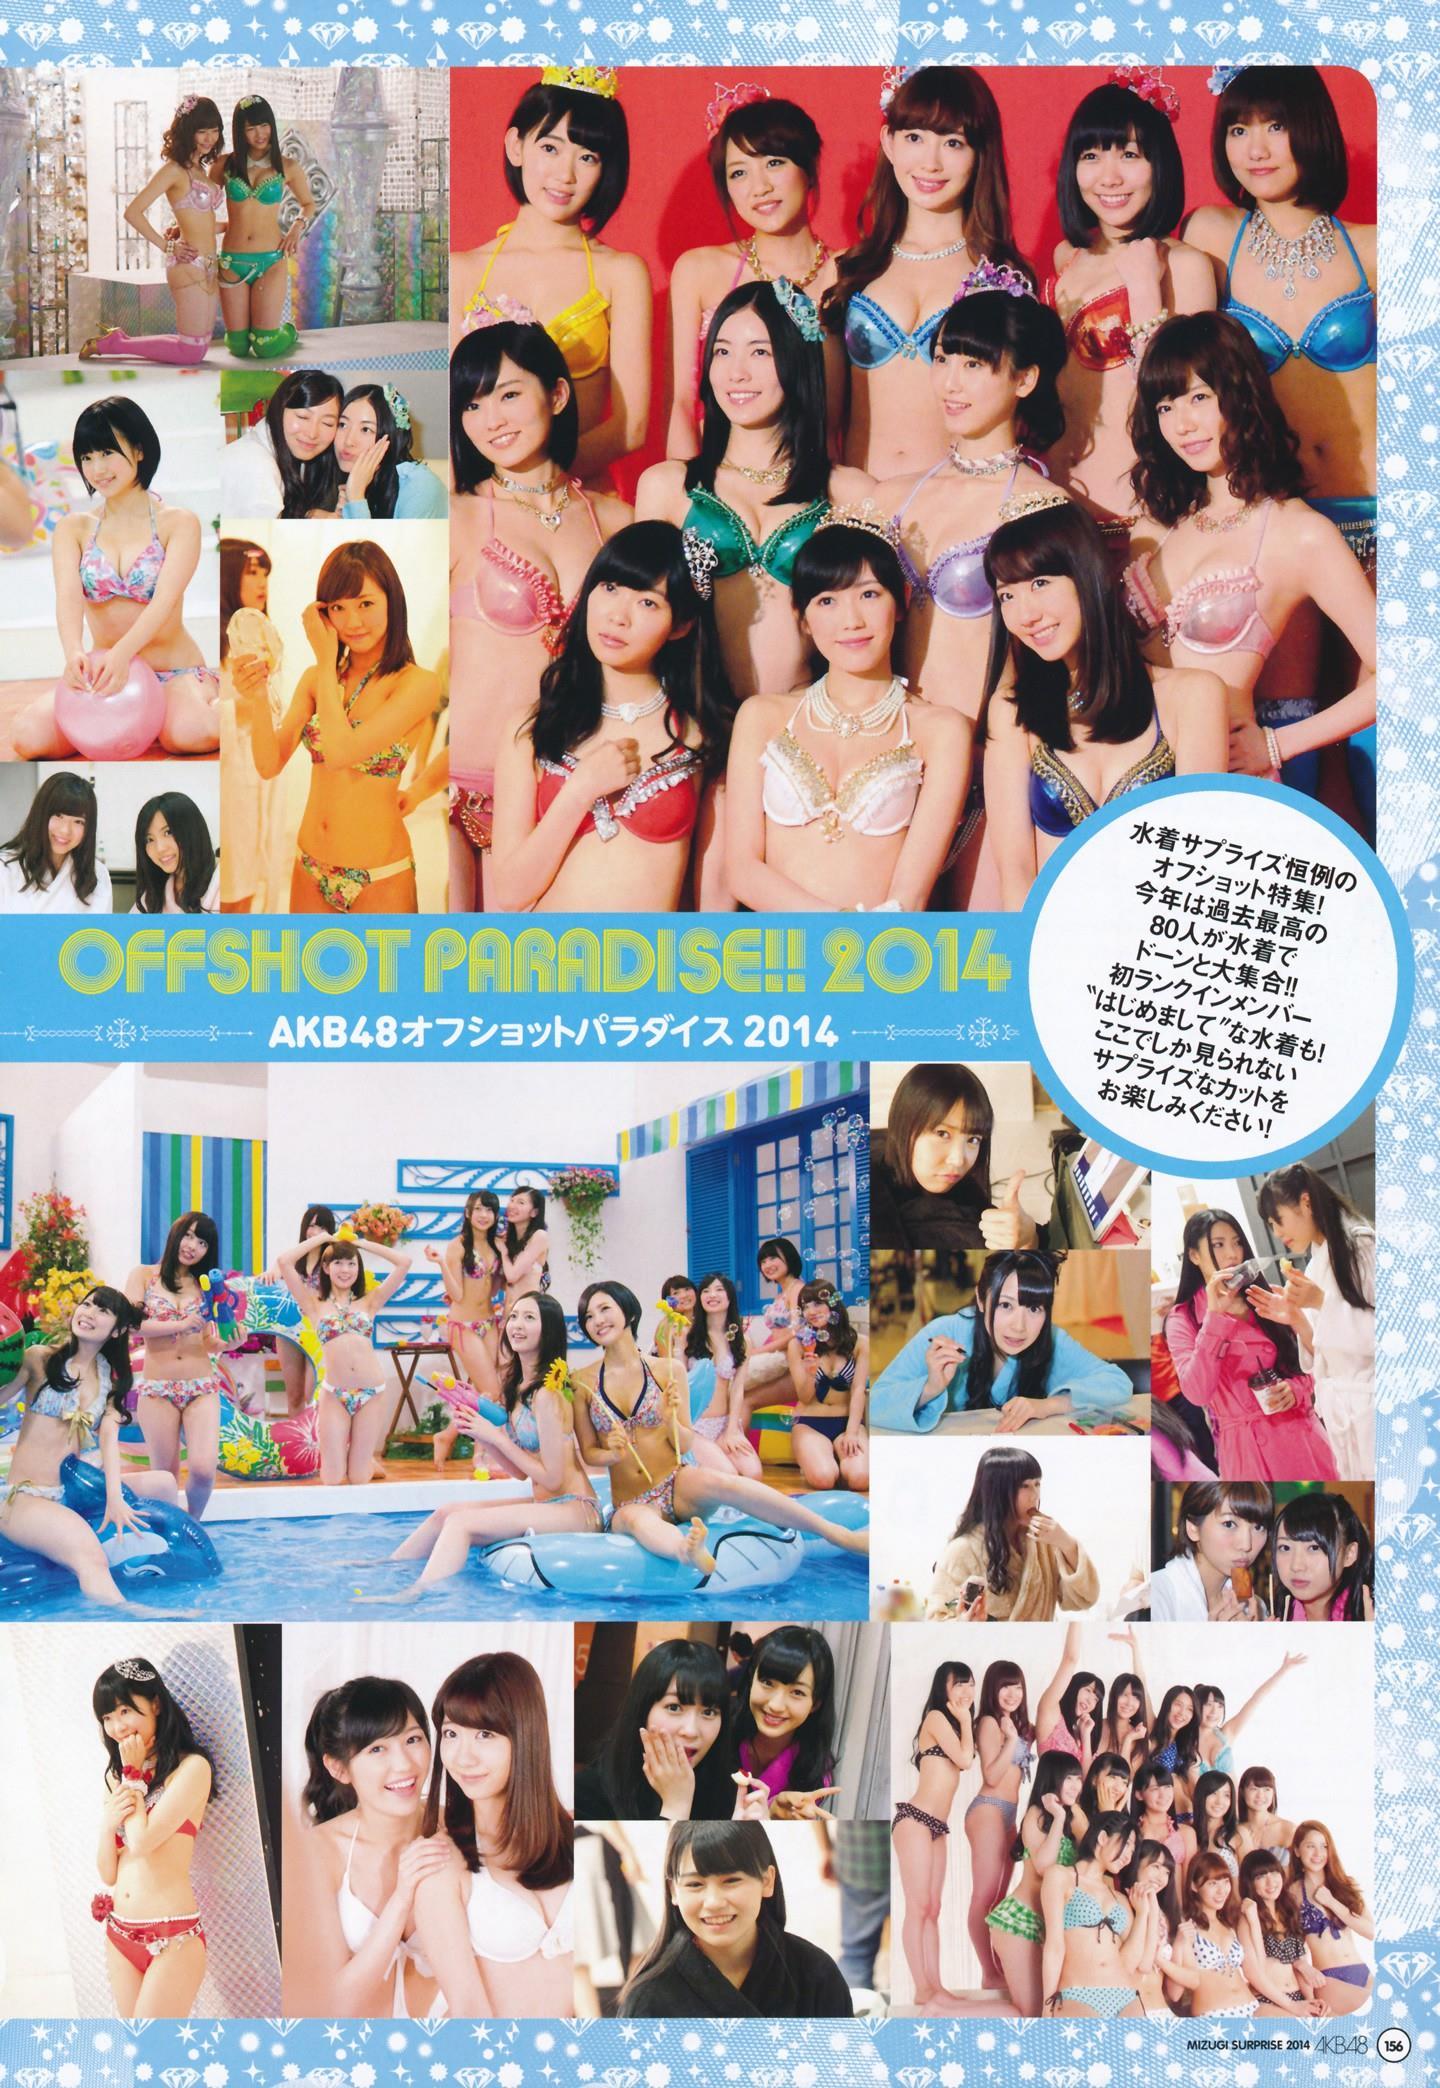 AKB48人気メンバー 画像 143